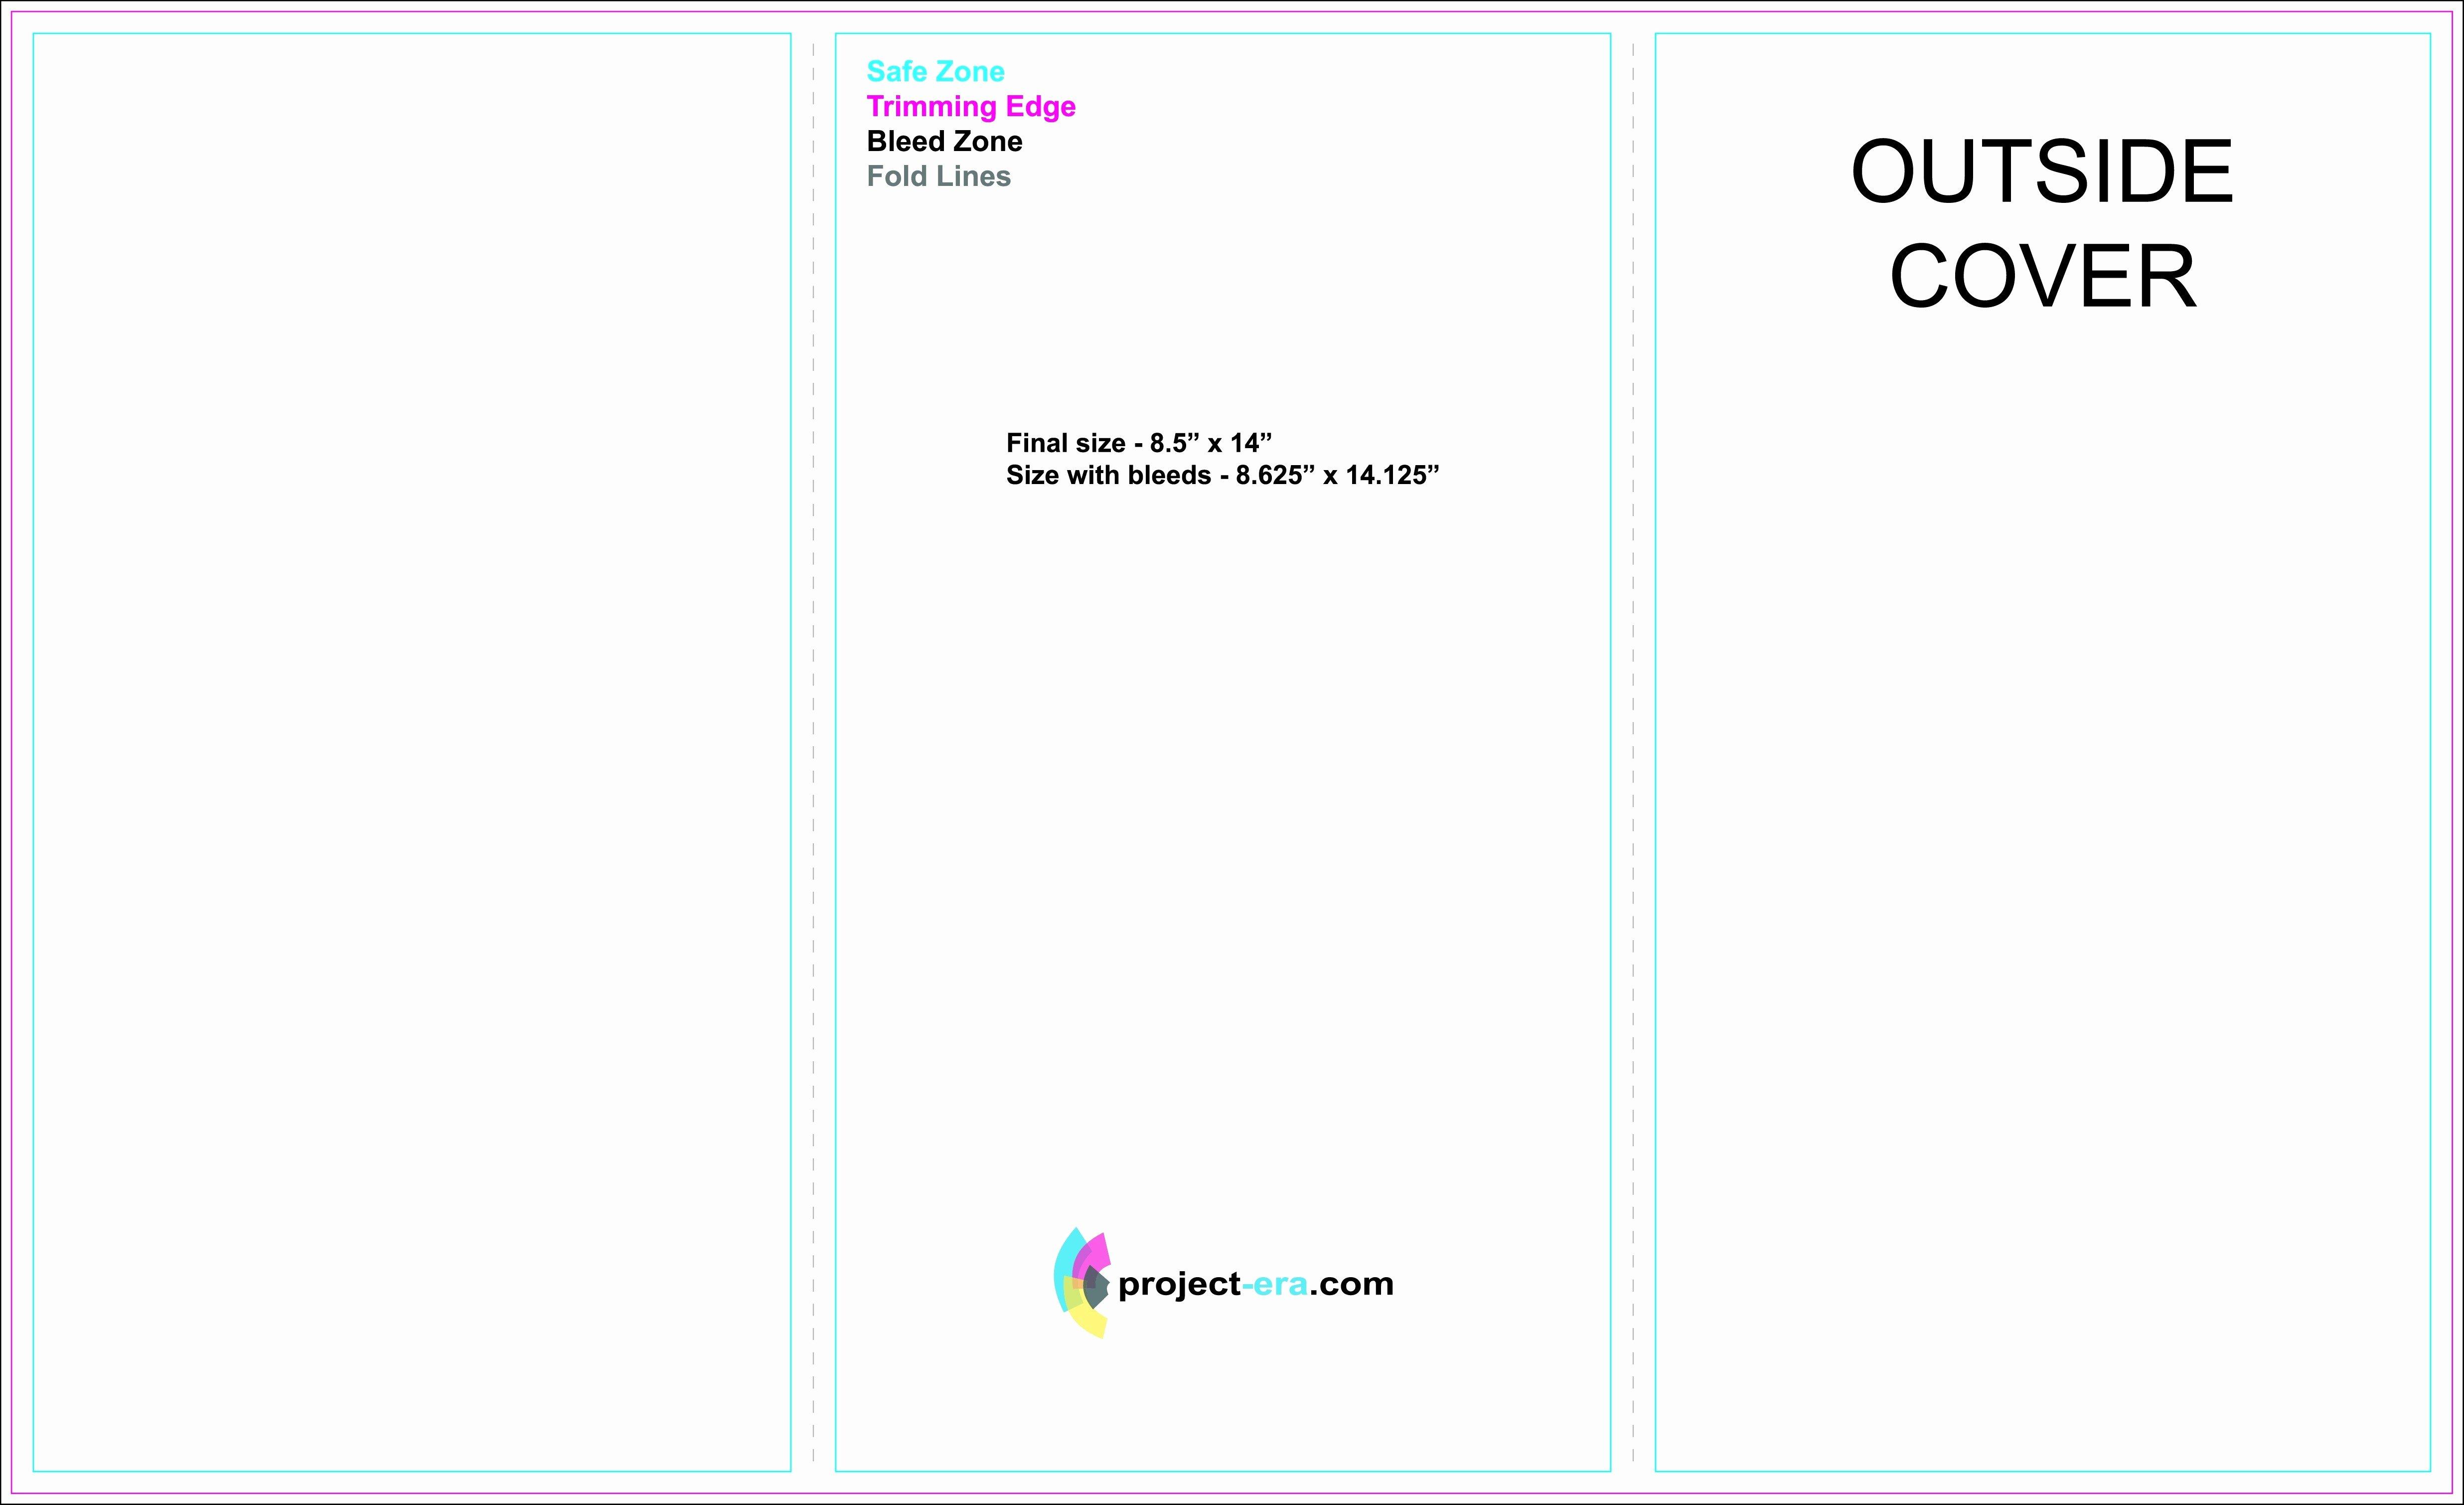 Google Brochure Template Free Luxury 3 Panel Brochure Template Google Docs sokobanjs